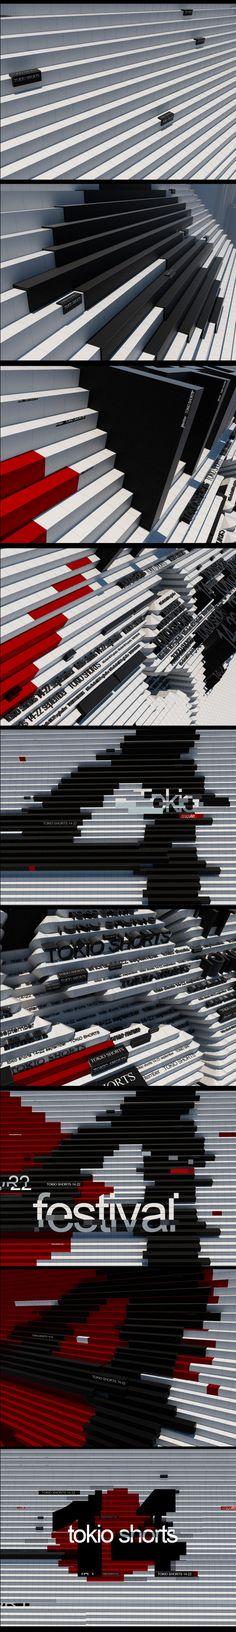 The 22thTOKYO INTERNATIAONAL FILM FESTIVAL by egor antonov, via Behance